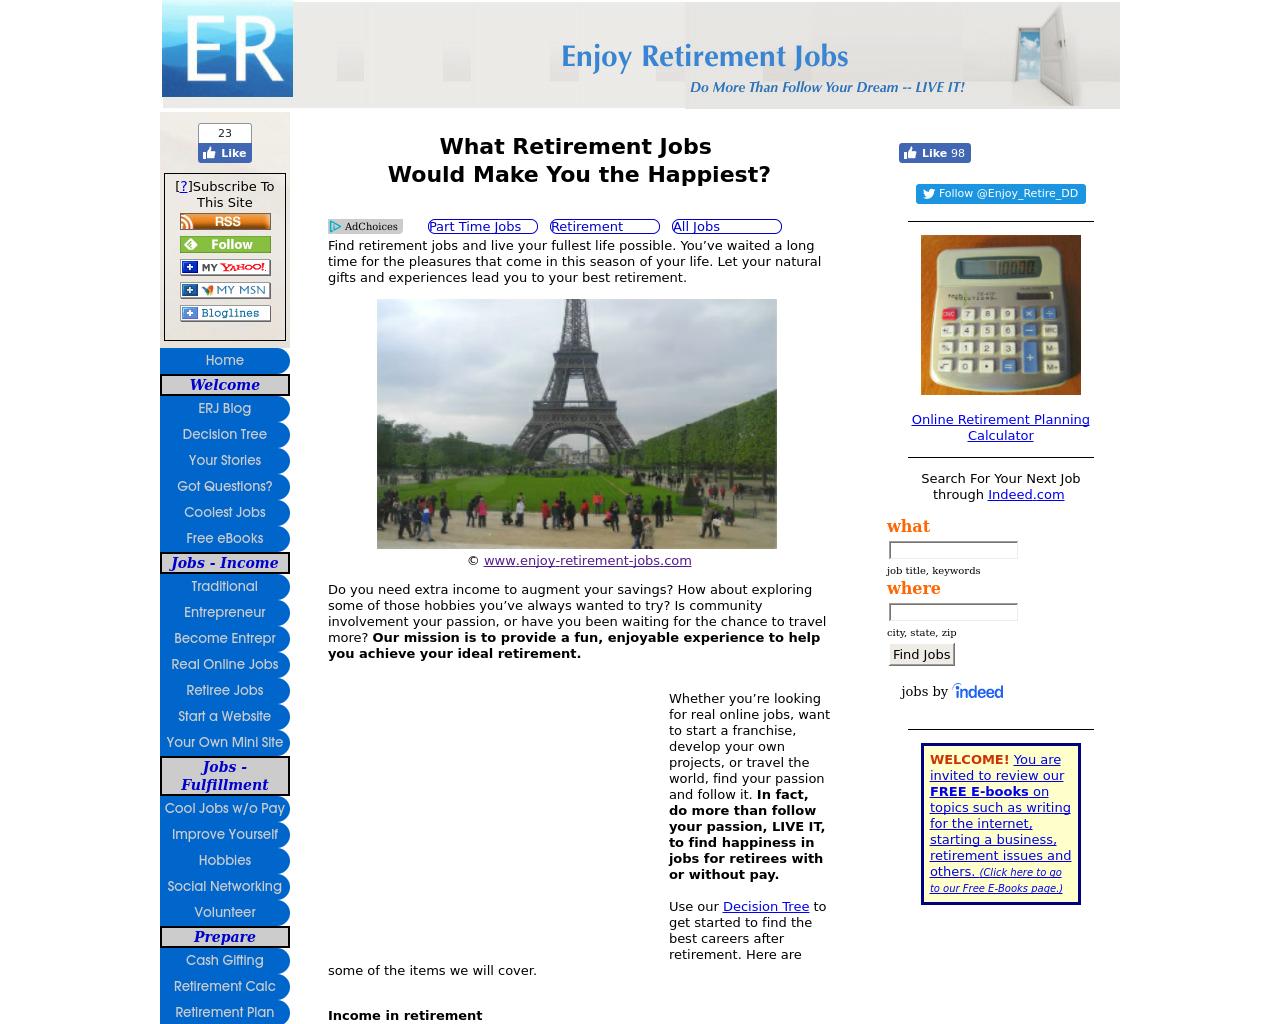 Enjoy-Retirement-Jobs-Advertising-Reviews-Pricing